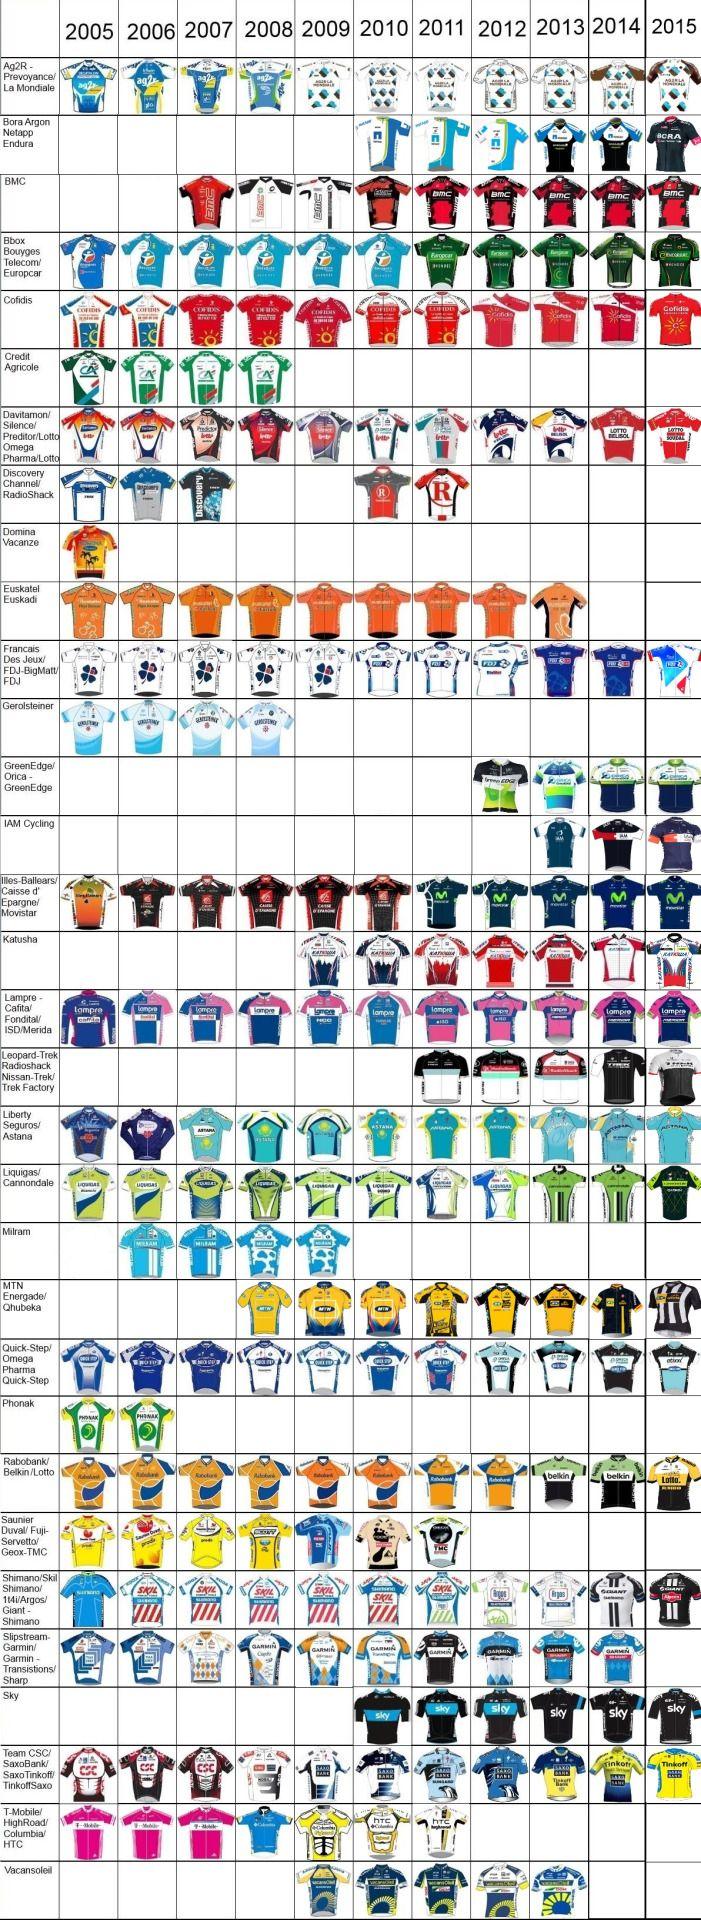 (2005-2015 Peloton fashions | Sicycleから)